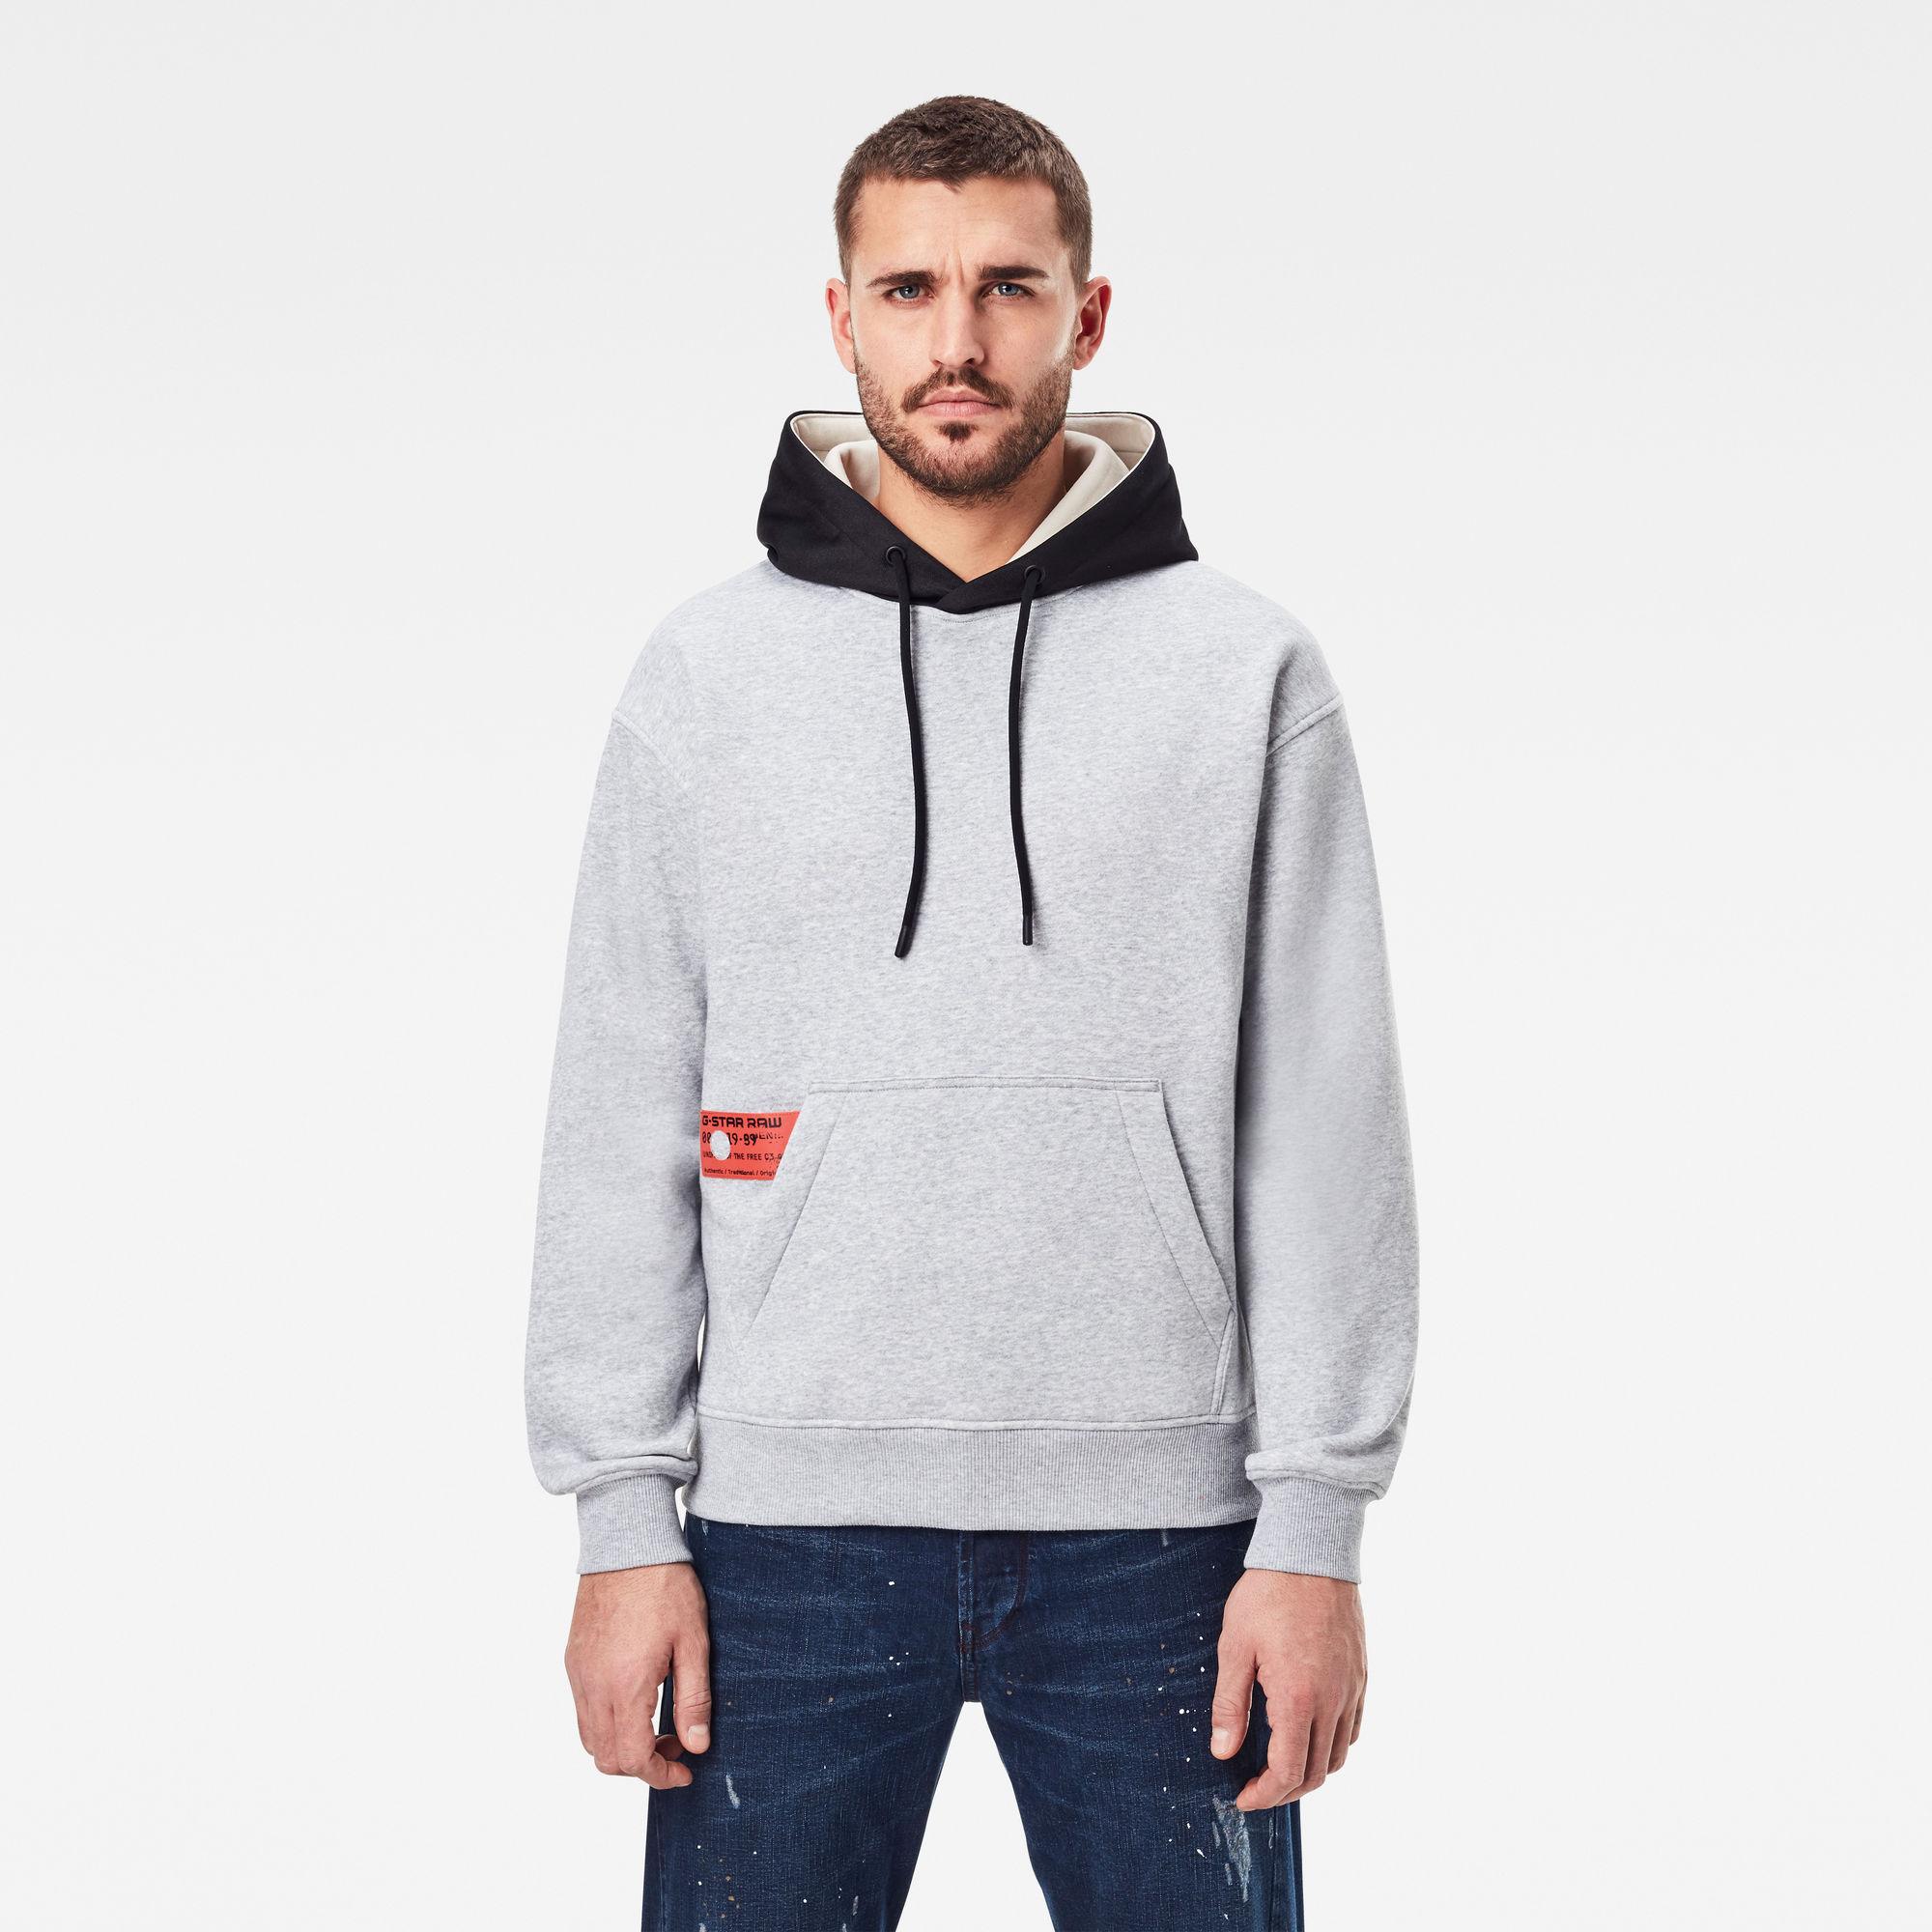 G-Star RAW Heren Contrast Hooded Sweater Grijs